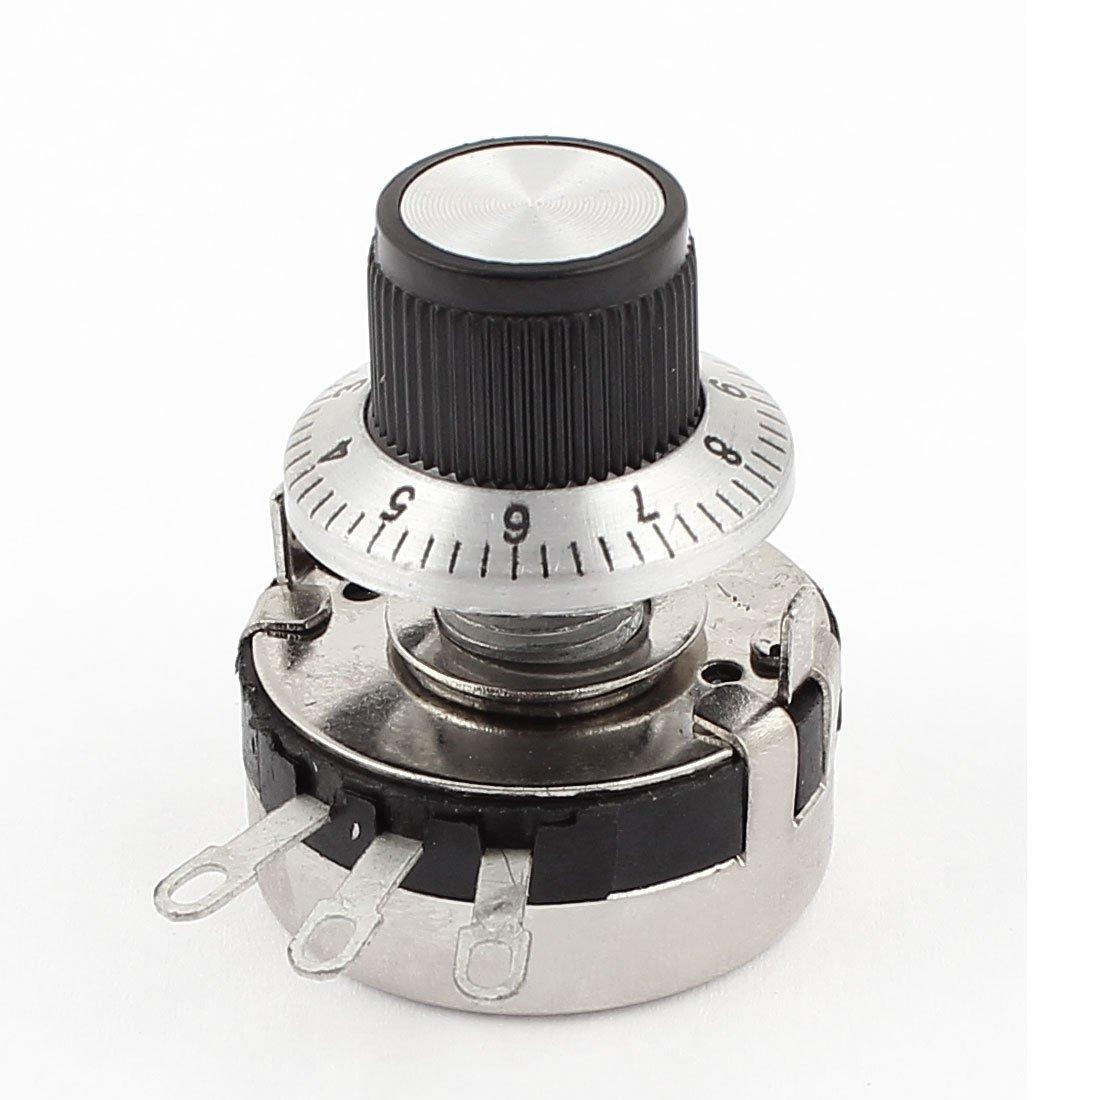 sourcing map WTH118-2W 10K ohm Rund Schaft Carbon Lineare Variation Potentiometer mit Dial Knopf DE de